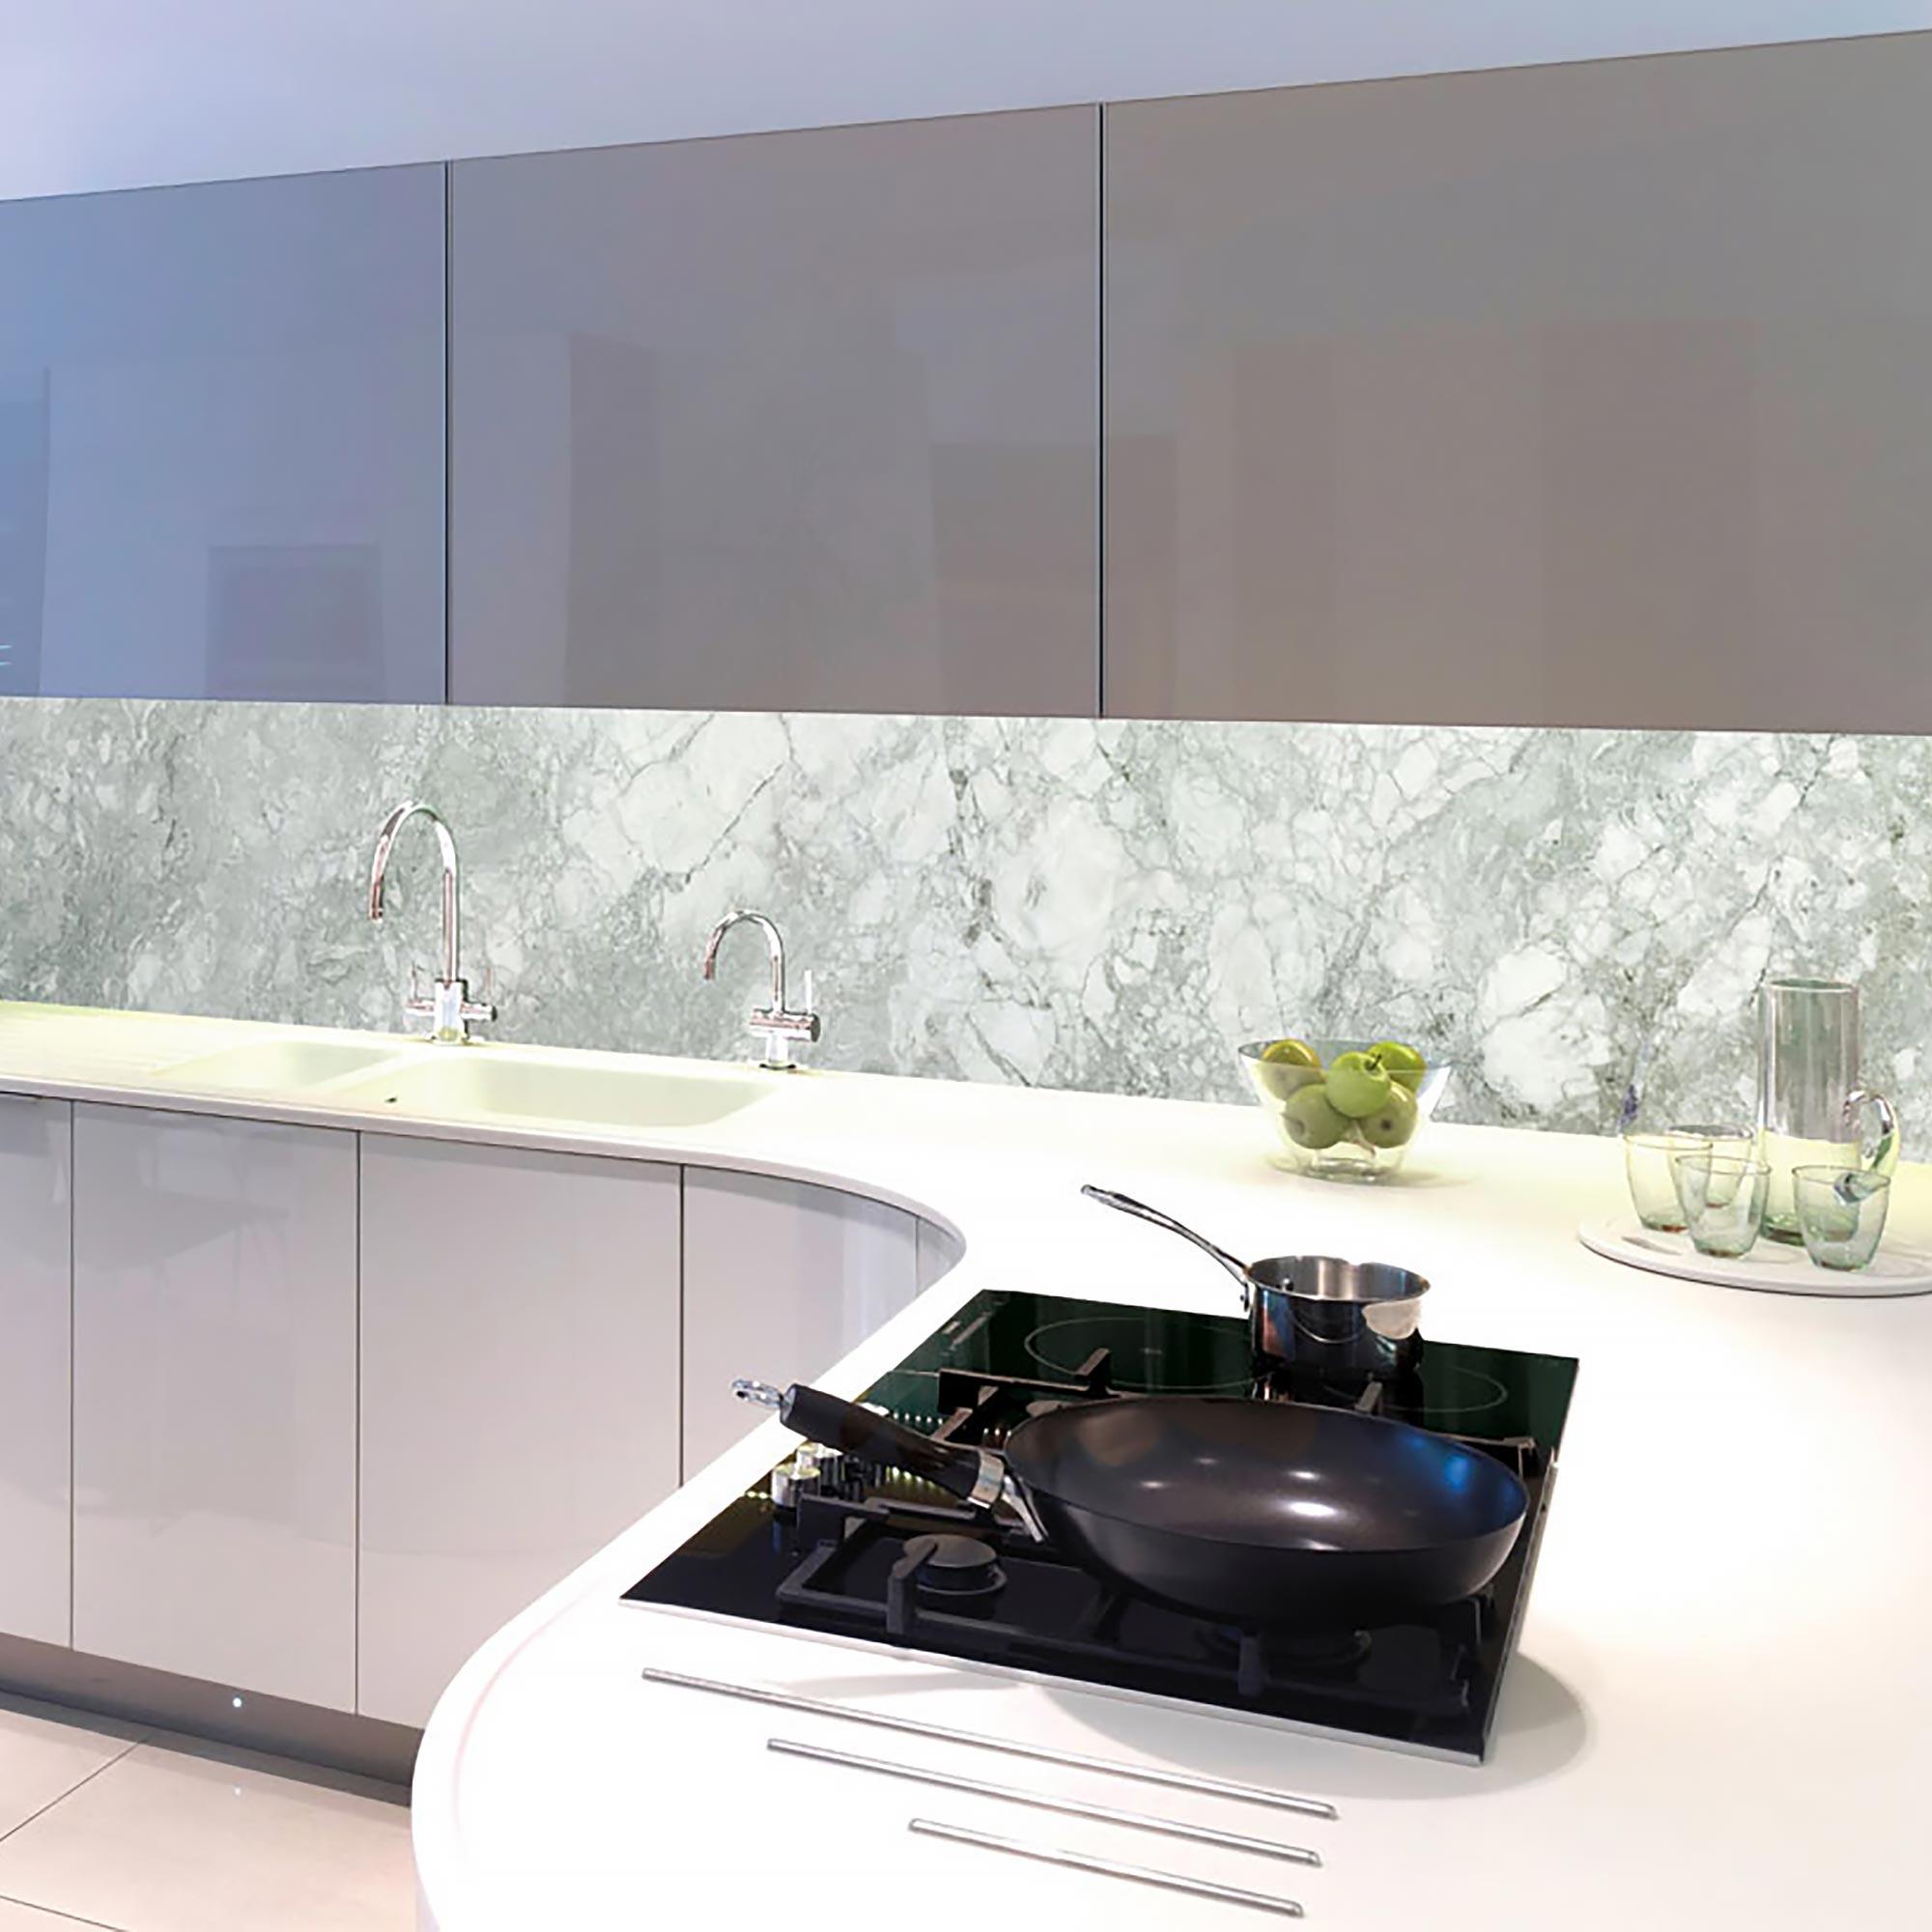 Kitchen splashback marble printed on glass